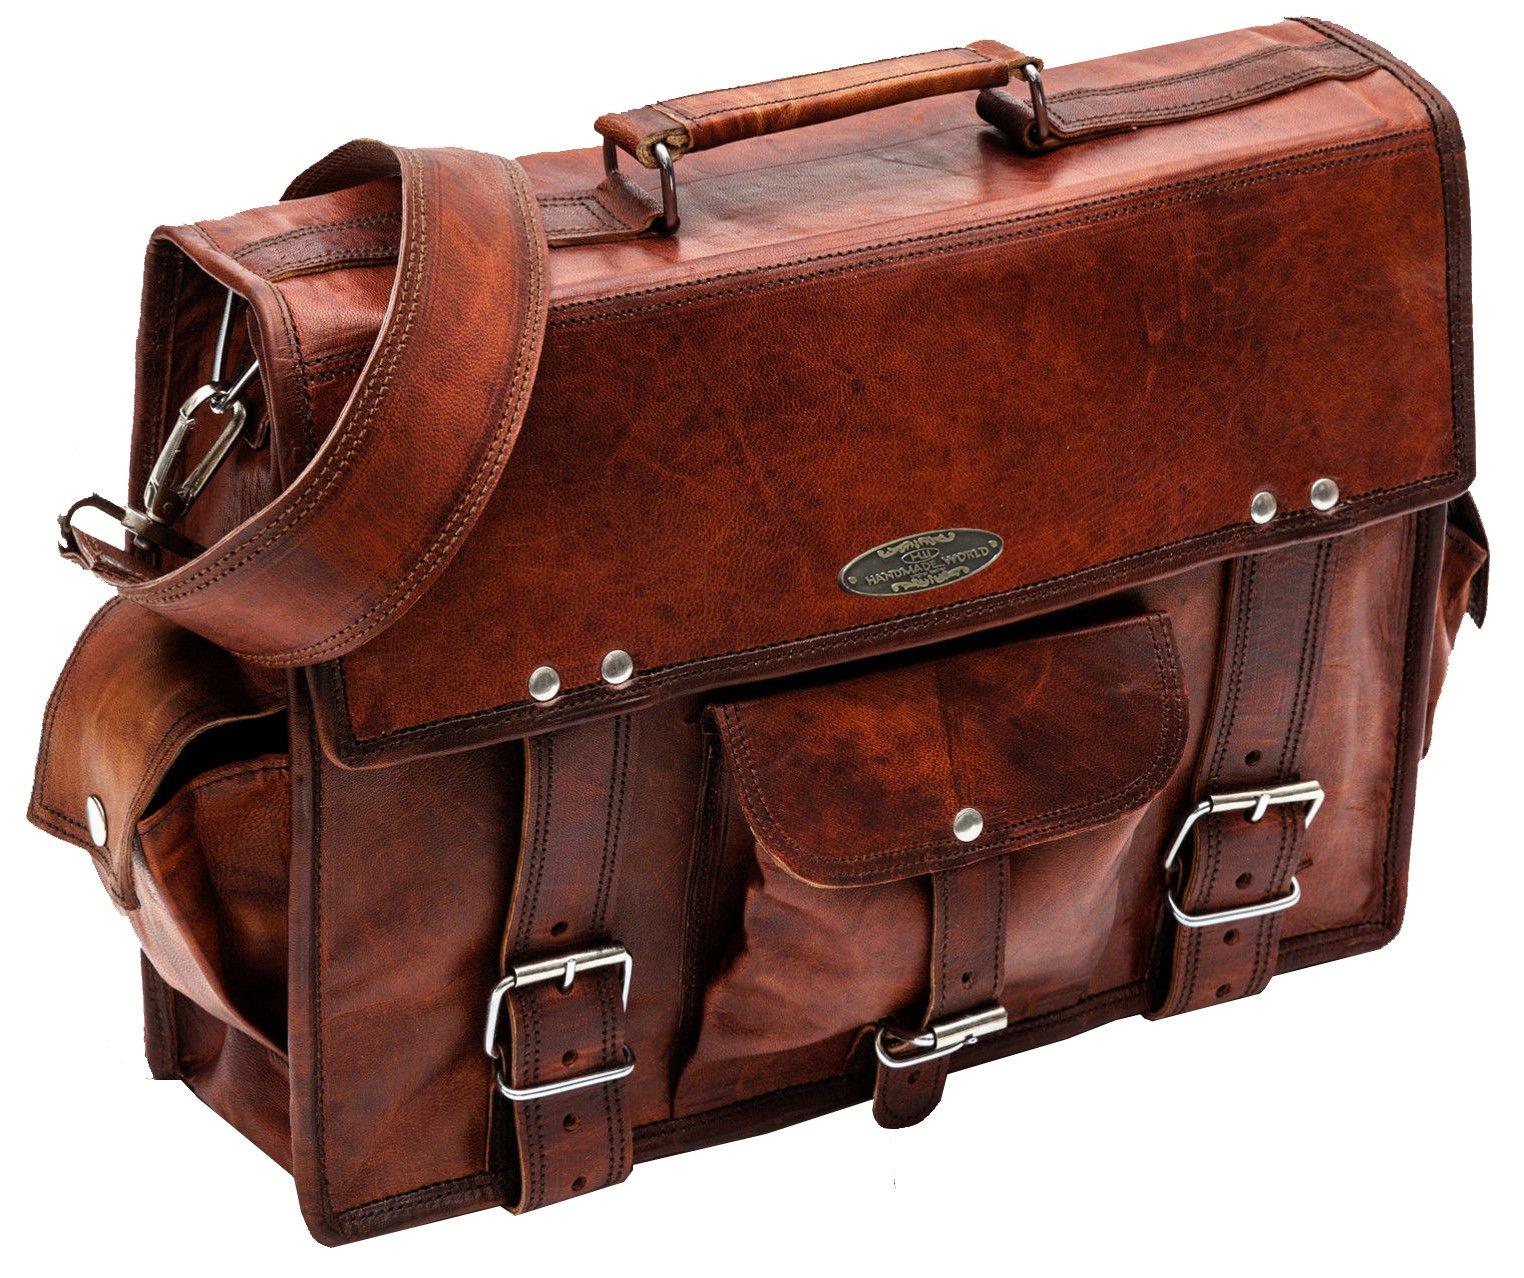 Handmade_world Leather Messenger Bags 15'' for Men Women Mens Briefcase Laptop Computer Satchel School Distressed Bag